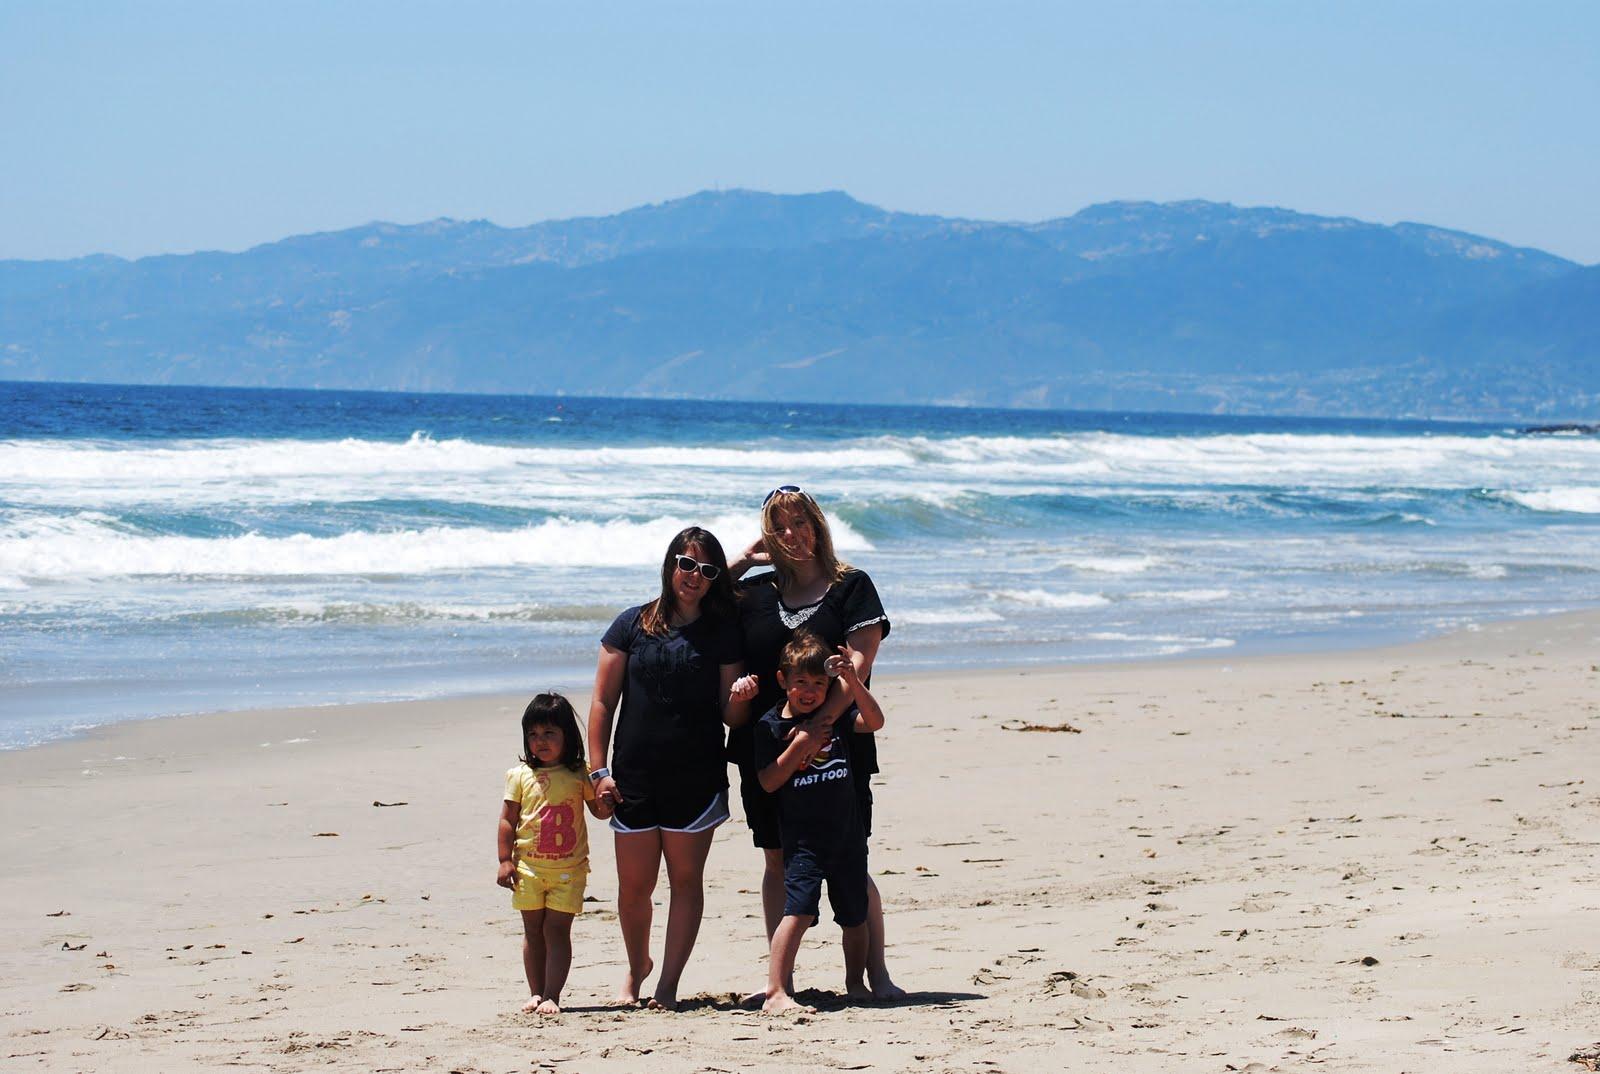 Summer 2011 | Venice Beach California